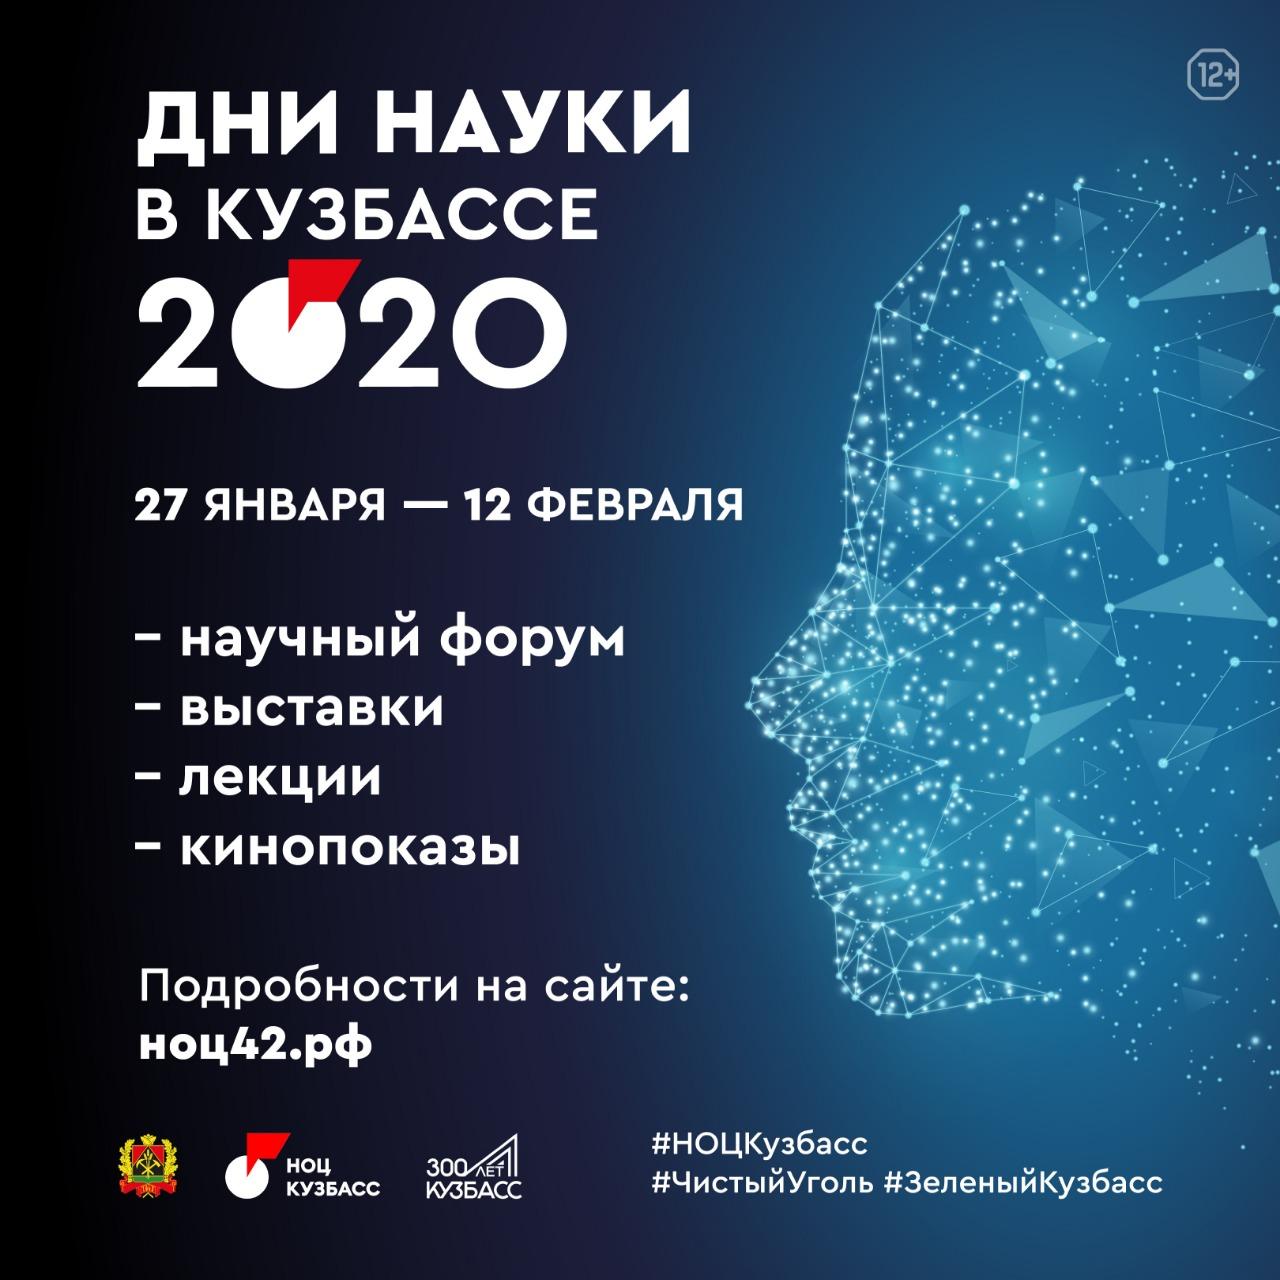 Дни науки в Кузбассе